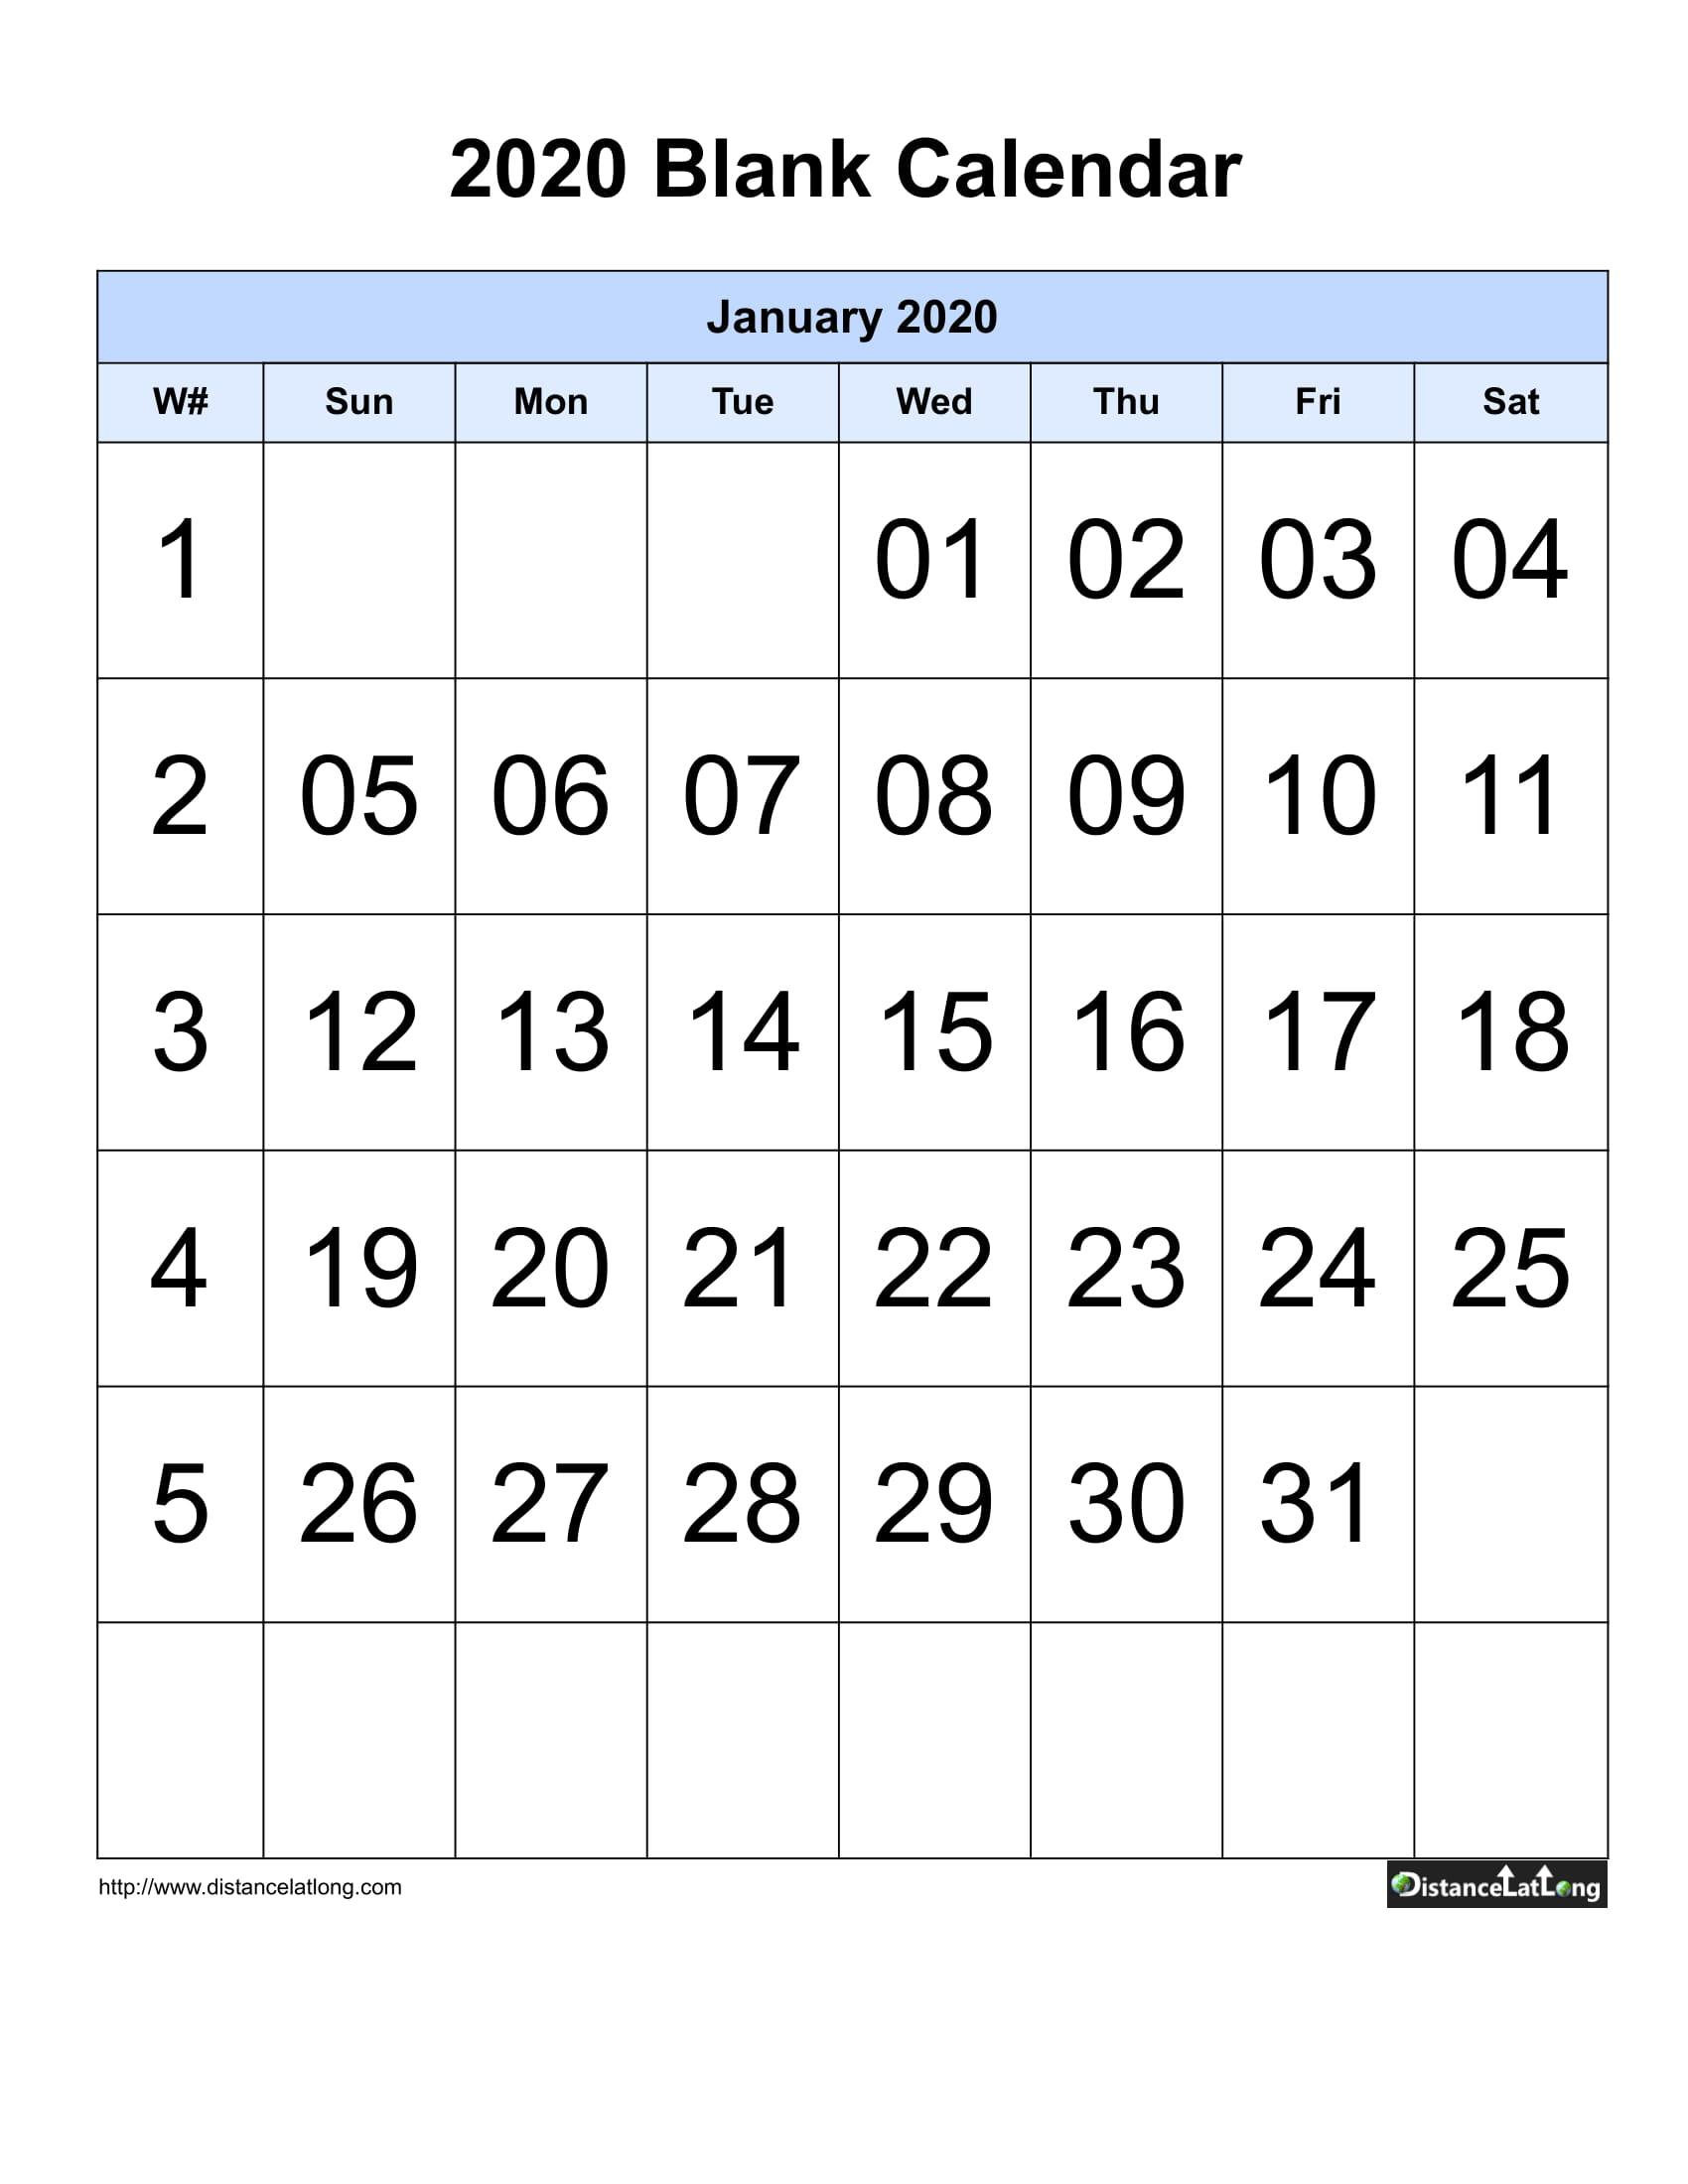 2019 Blank Calendar Blank Portrait Orientation Free in Free Printable Calendar 4 Months Per Page